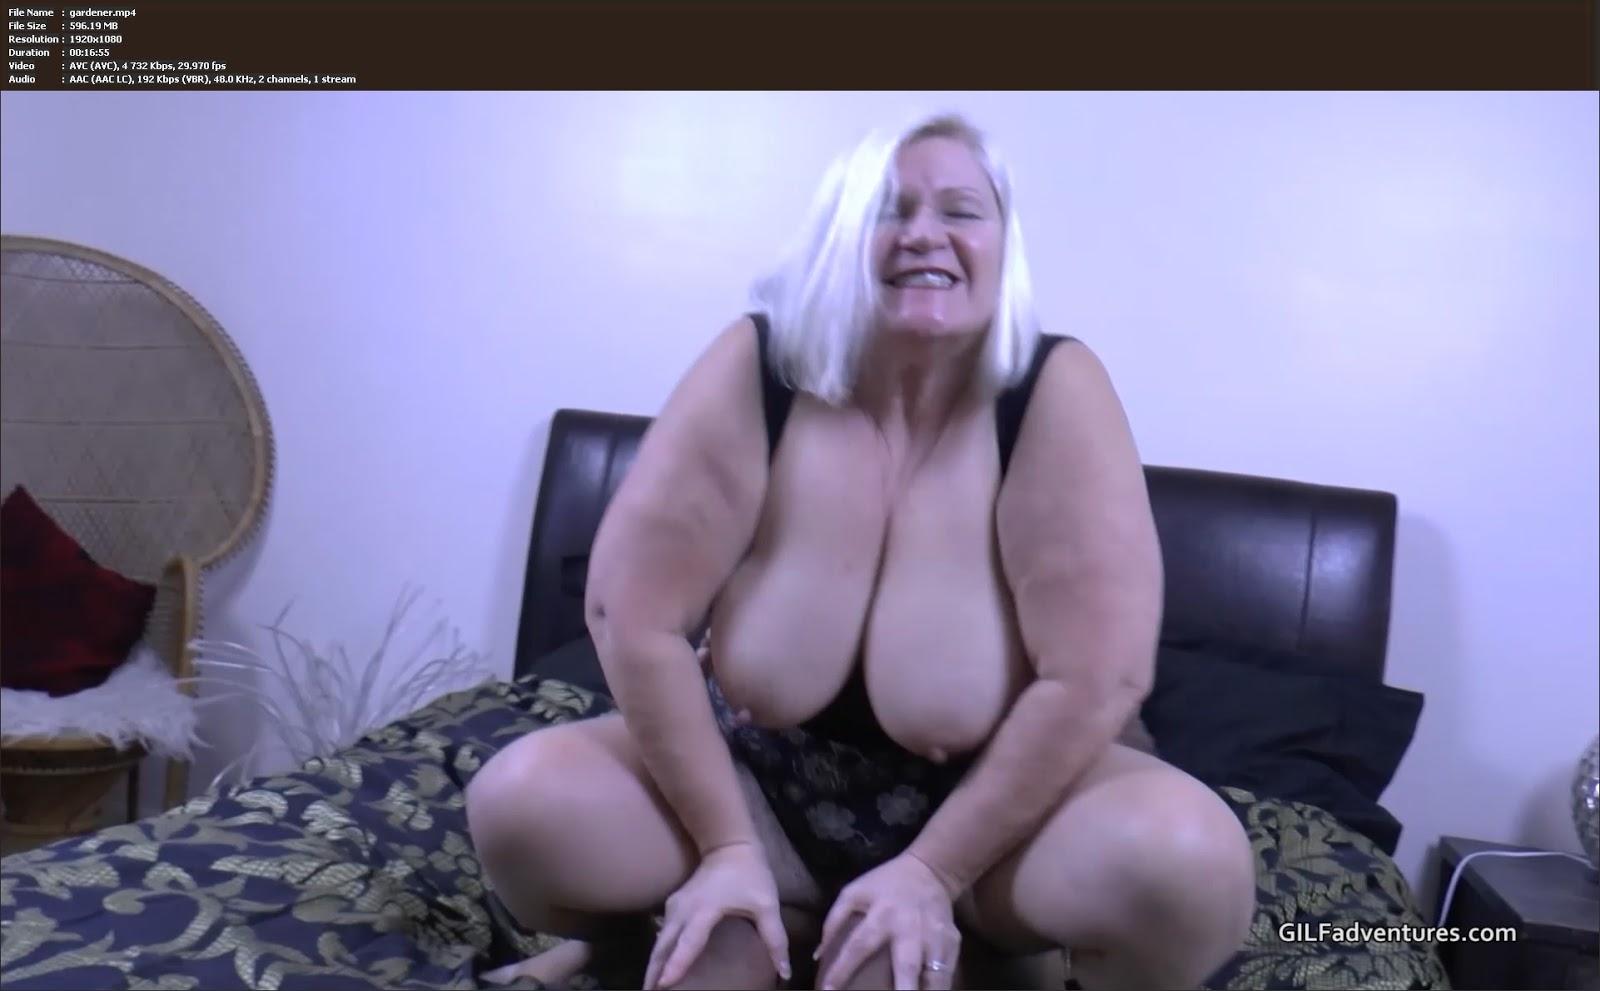 Chubby pregnat women